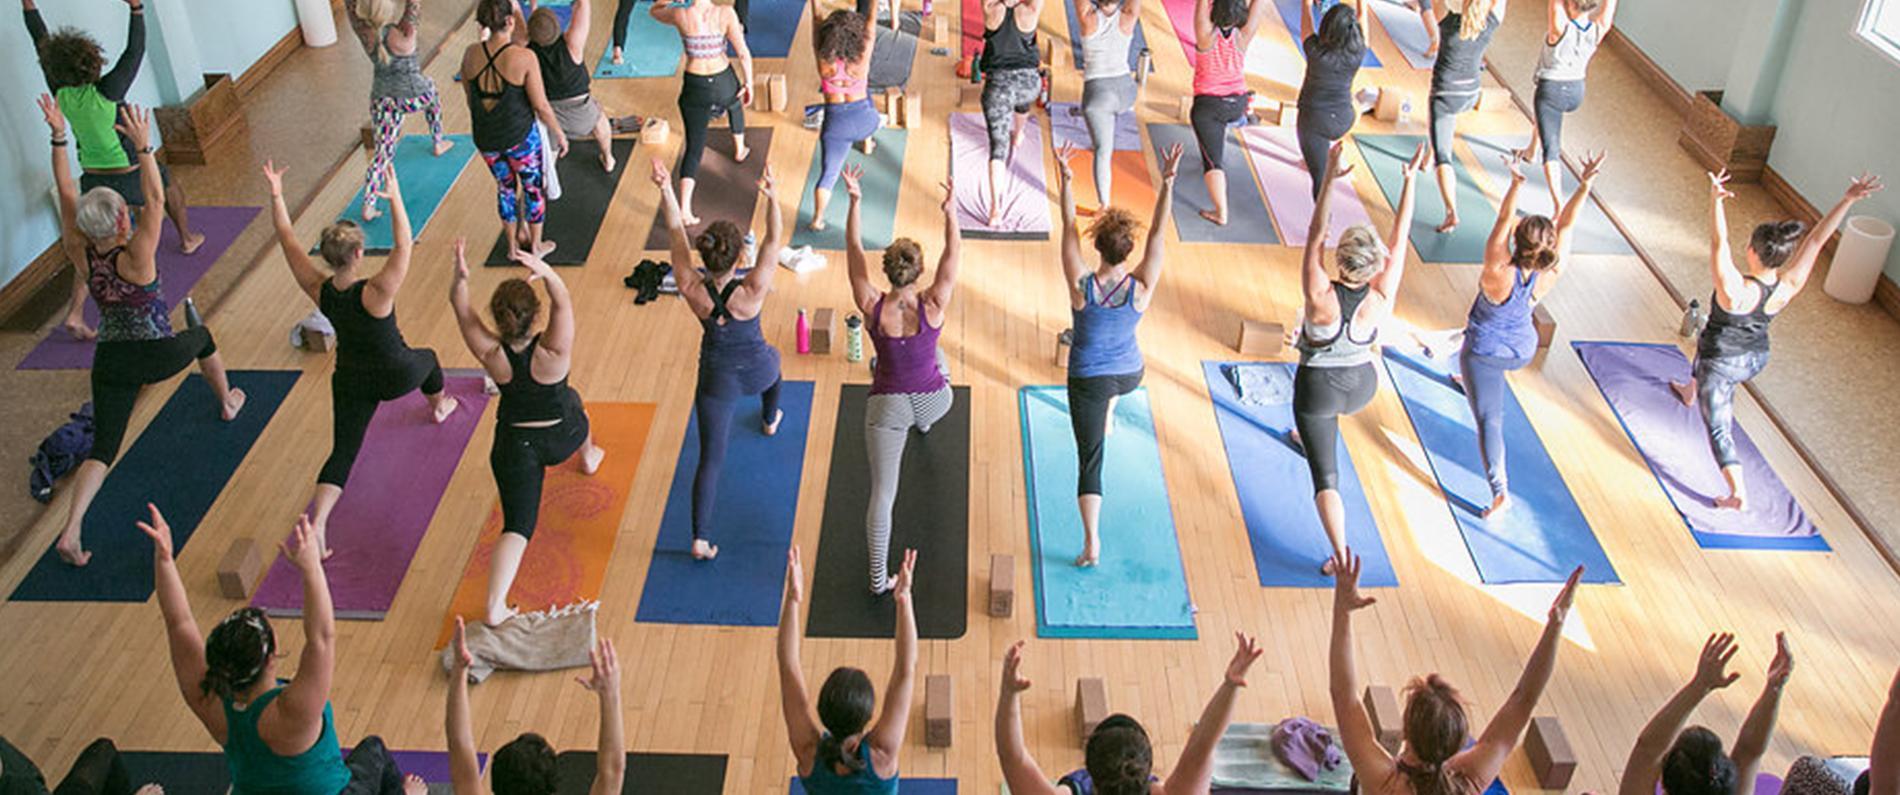 yoga practice in studio